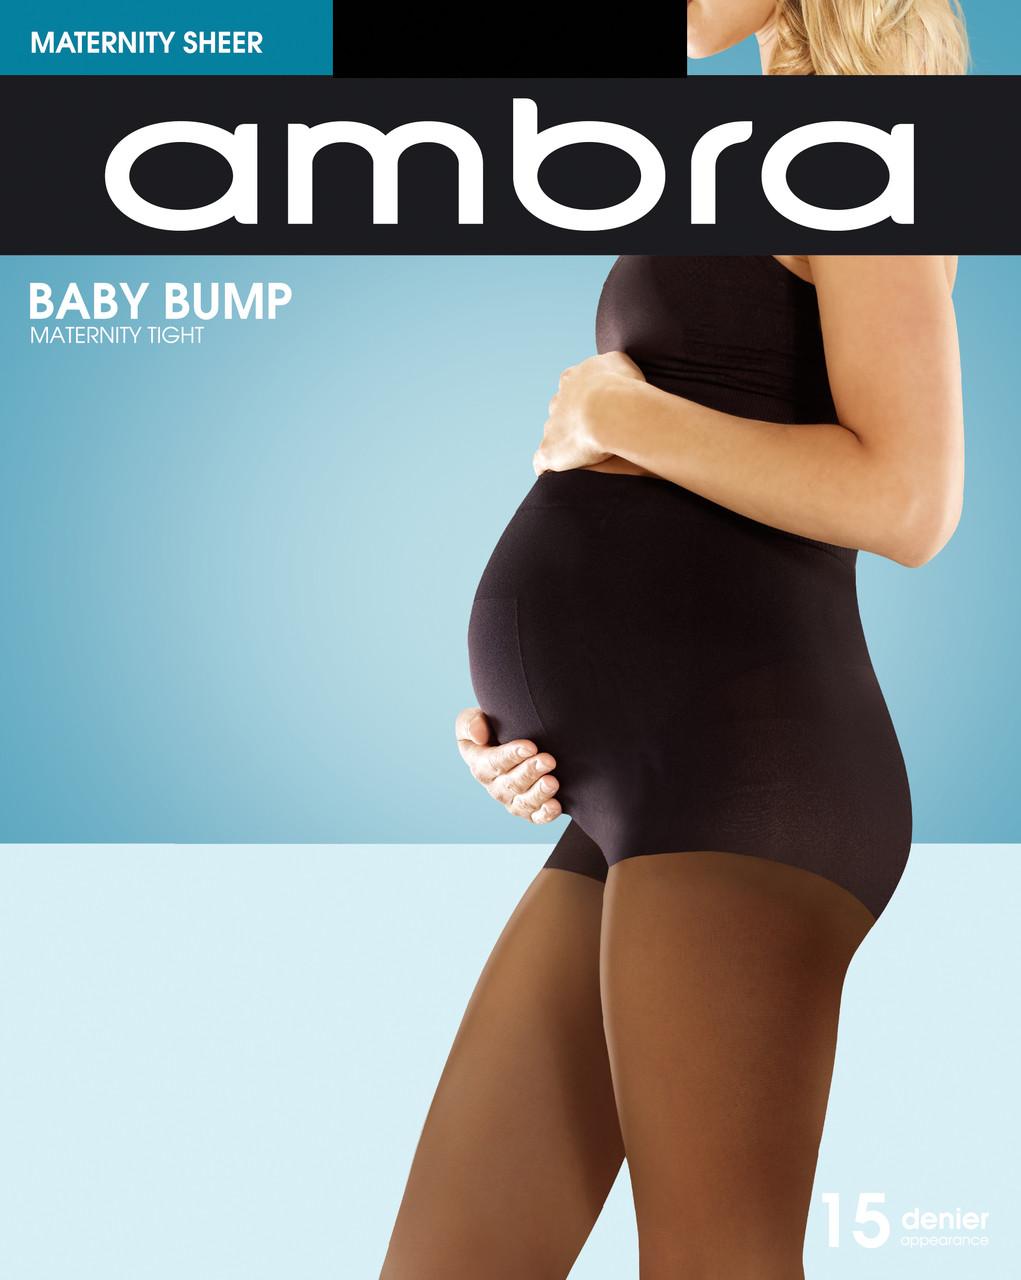 a19924d66f0ec Ambra Baby Bump Maternity Sheer 15 Denier - The Hobart Stocking Shop